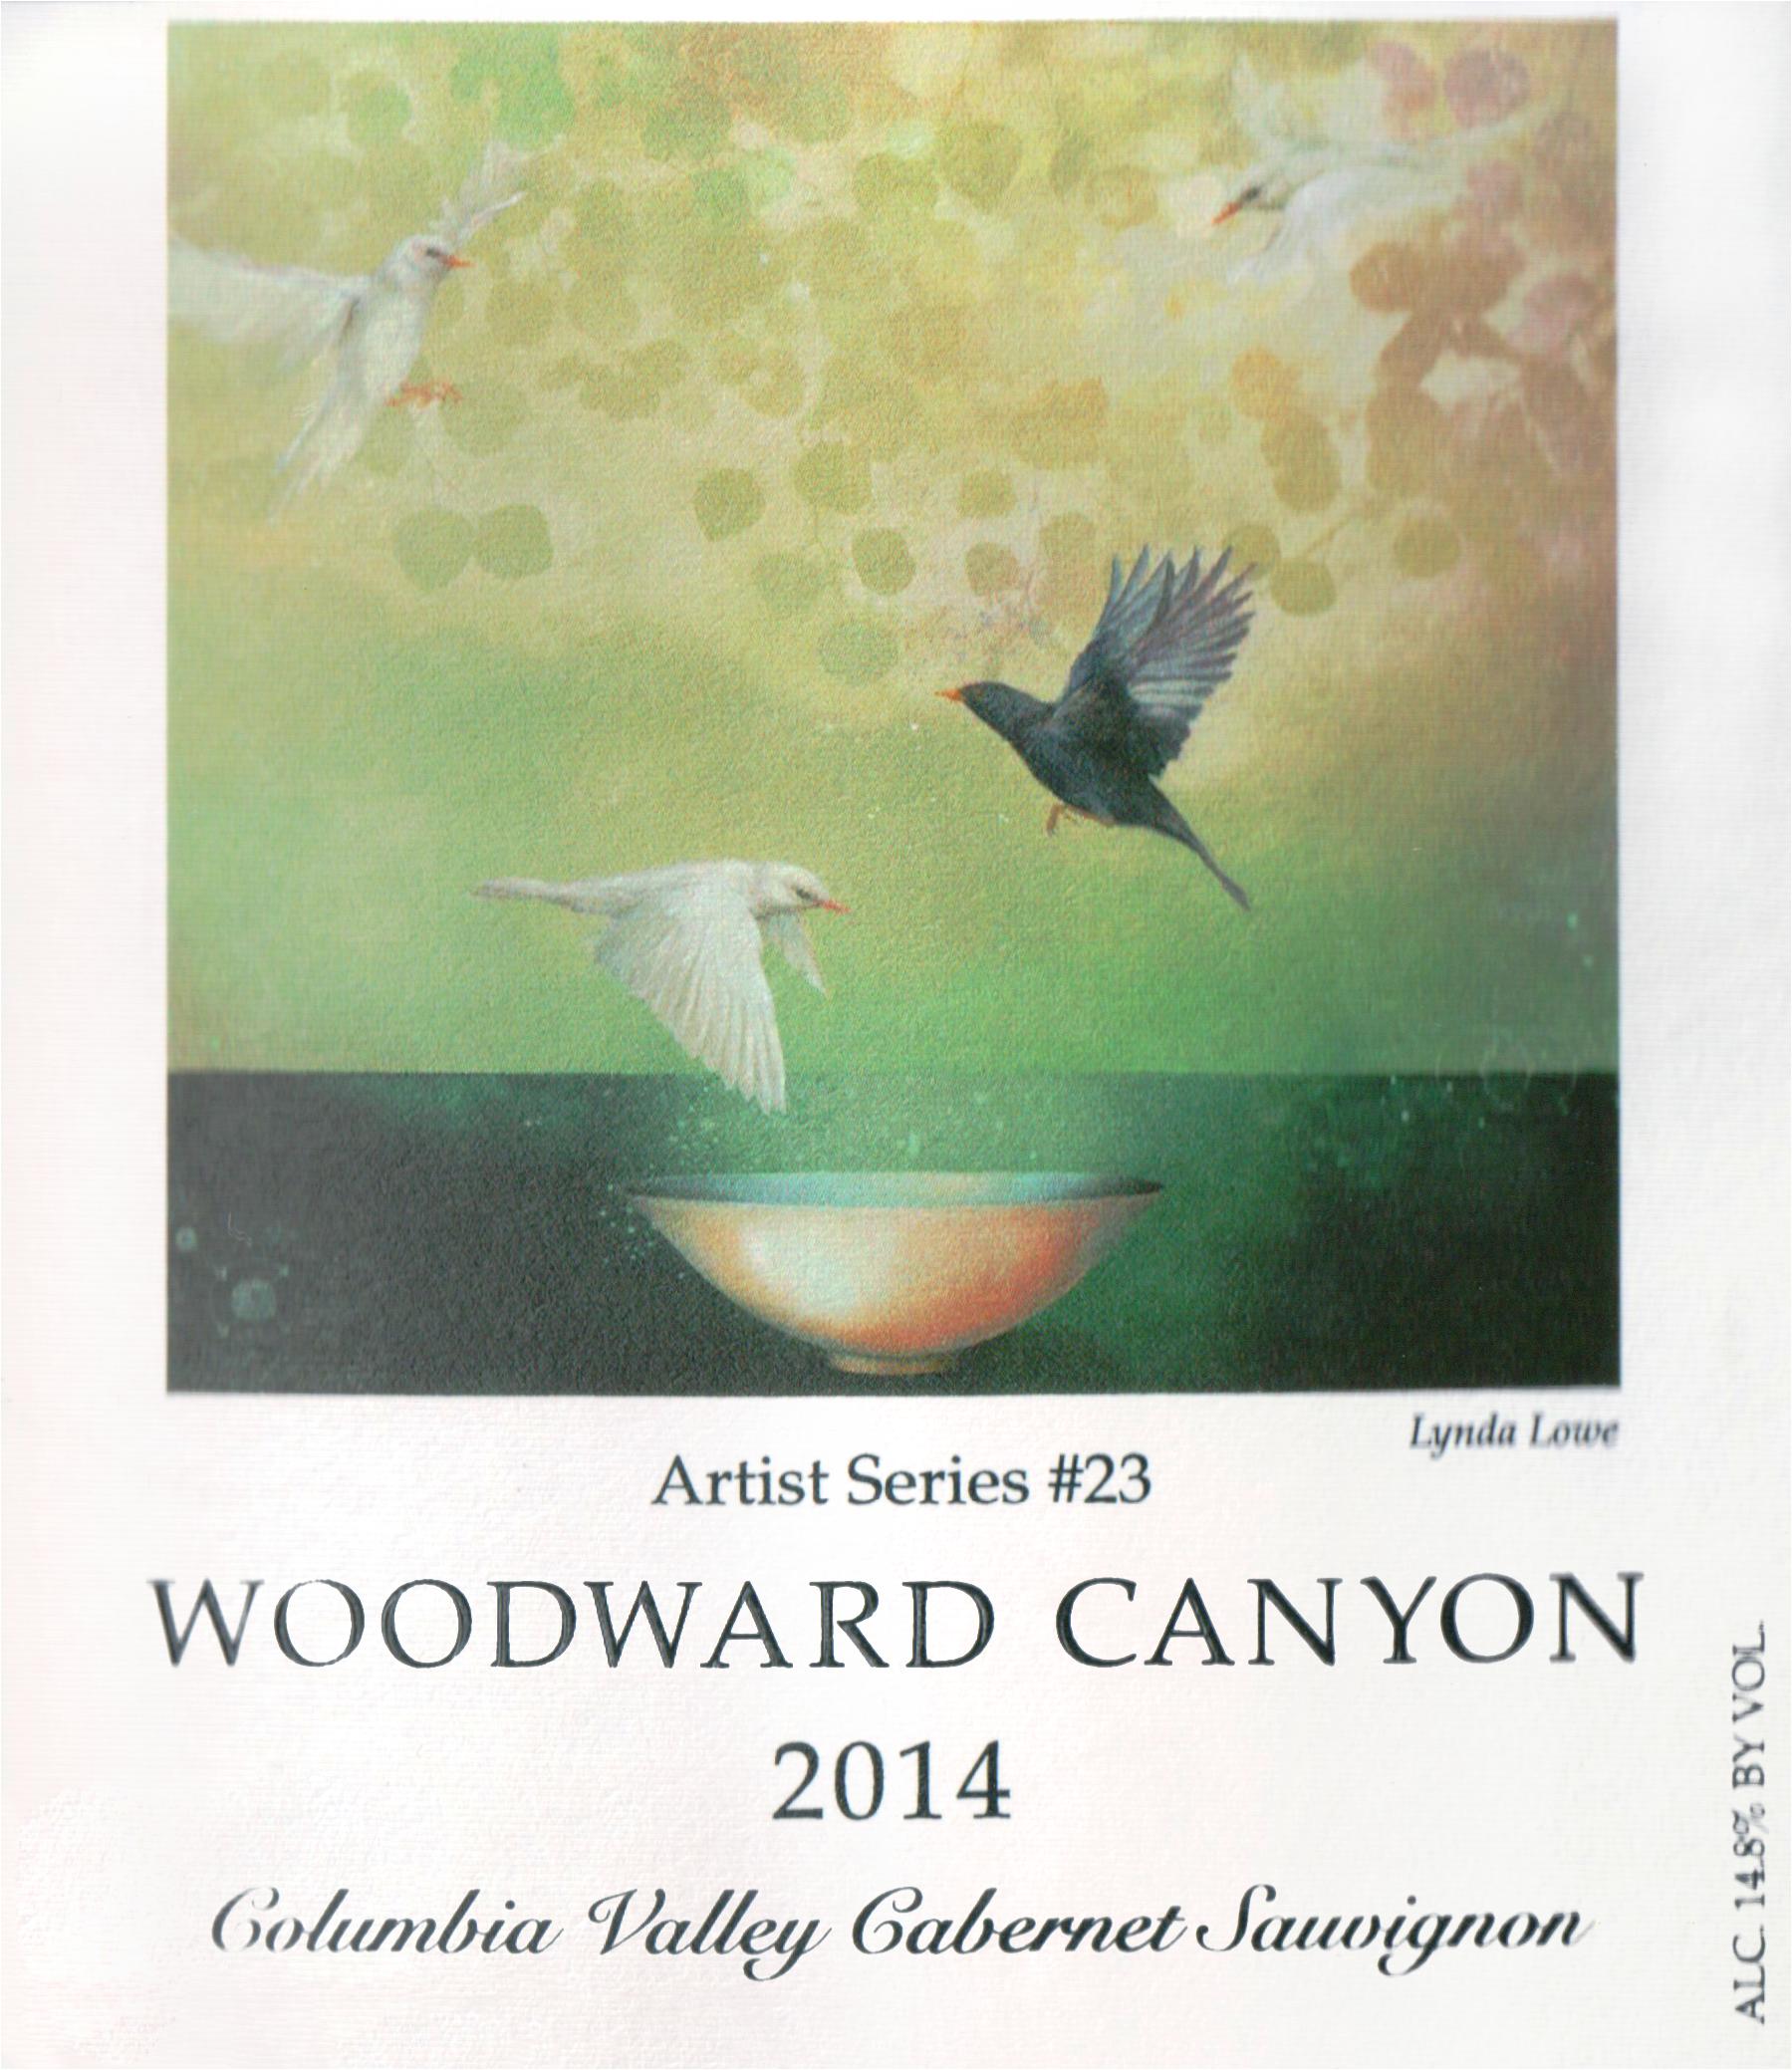 Woodward Canyon Cabernet Sauvignon Artist Series 2014